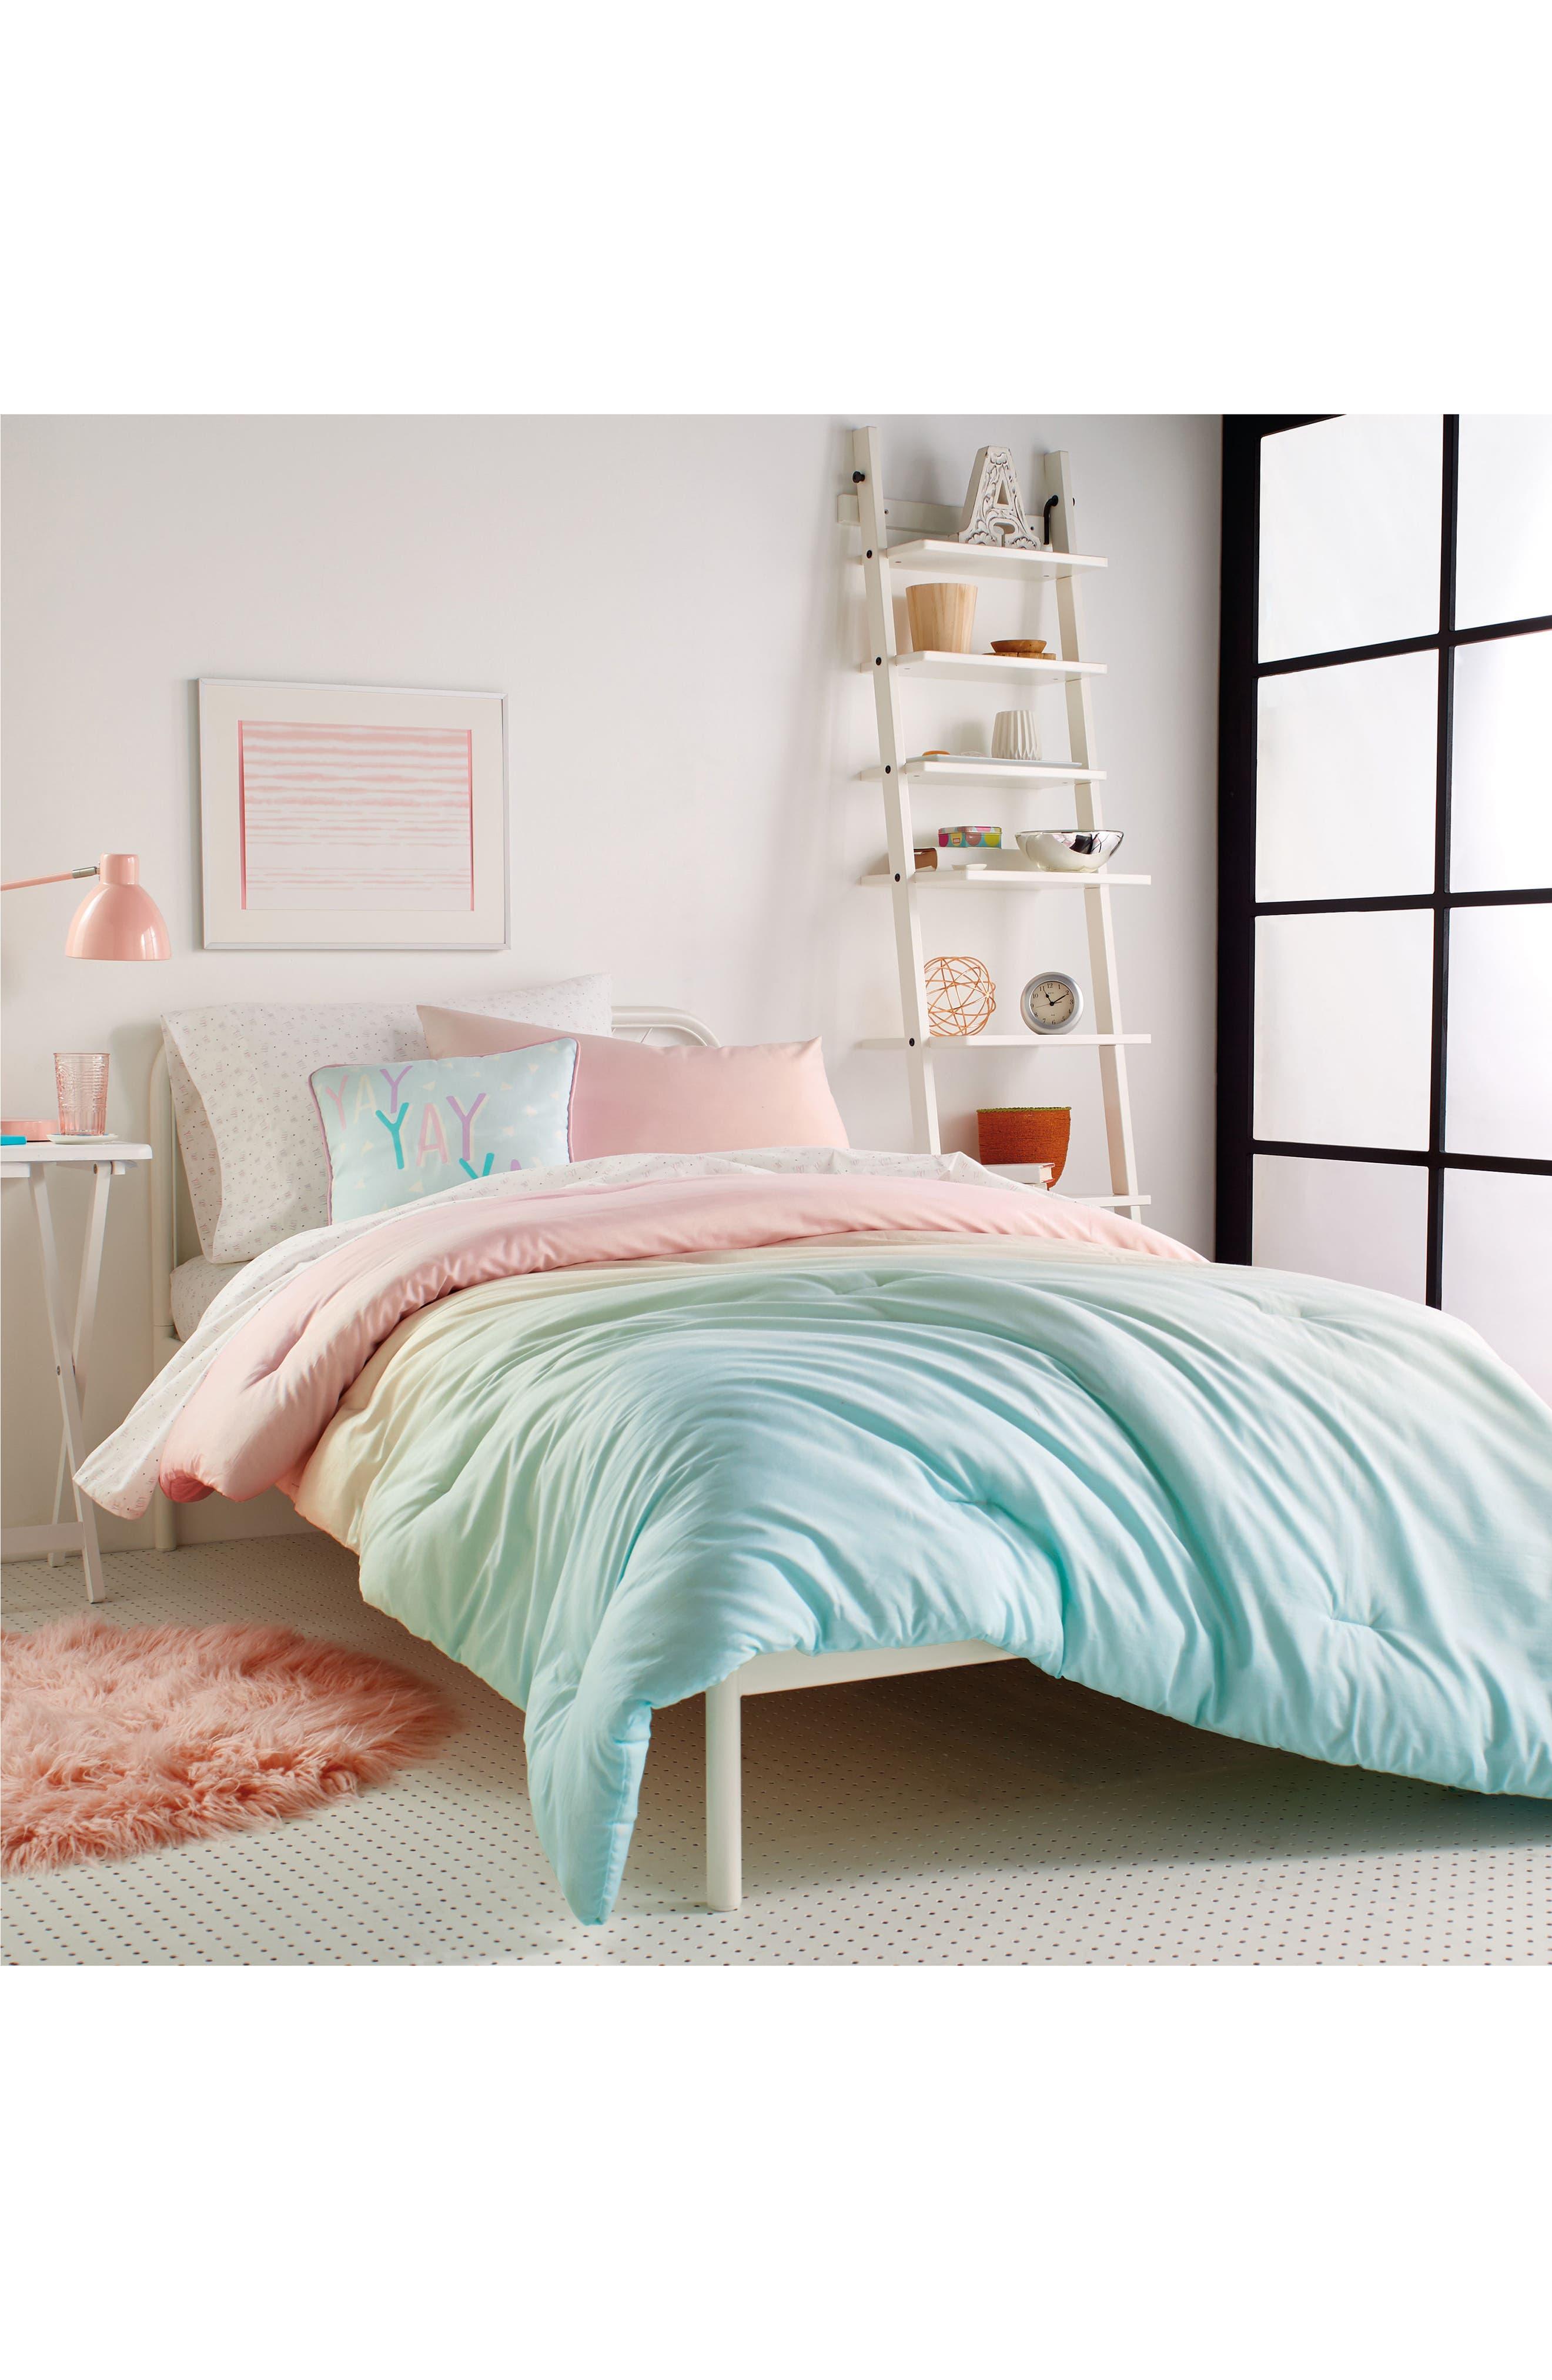 DKNY, Empire Light Comforter, Sham & Accent Pillow Set, Alternate thumbnail 6, color, 675